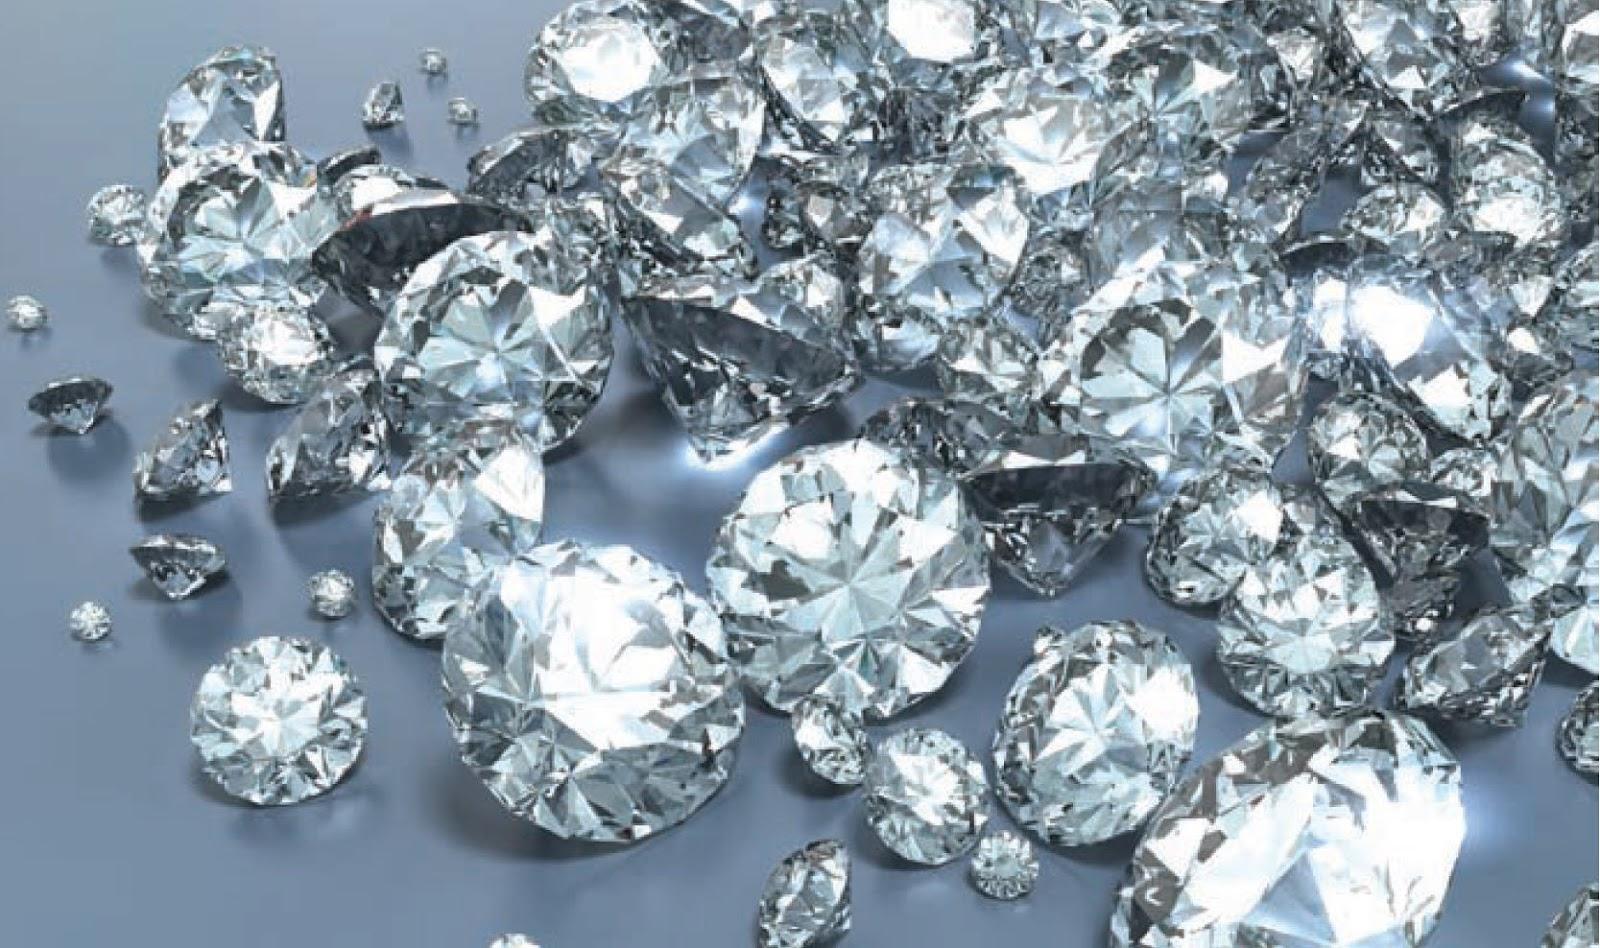 Shining Diamonds Stock Photo 114395242 : Shutterstock